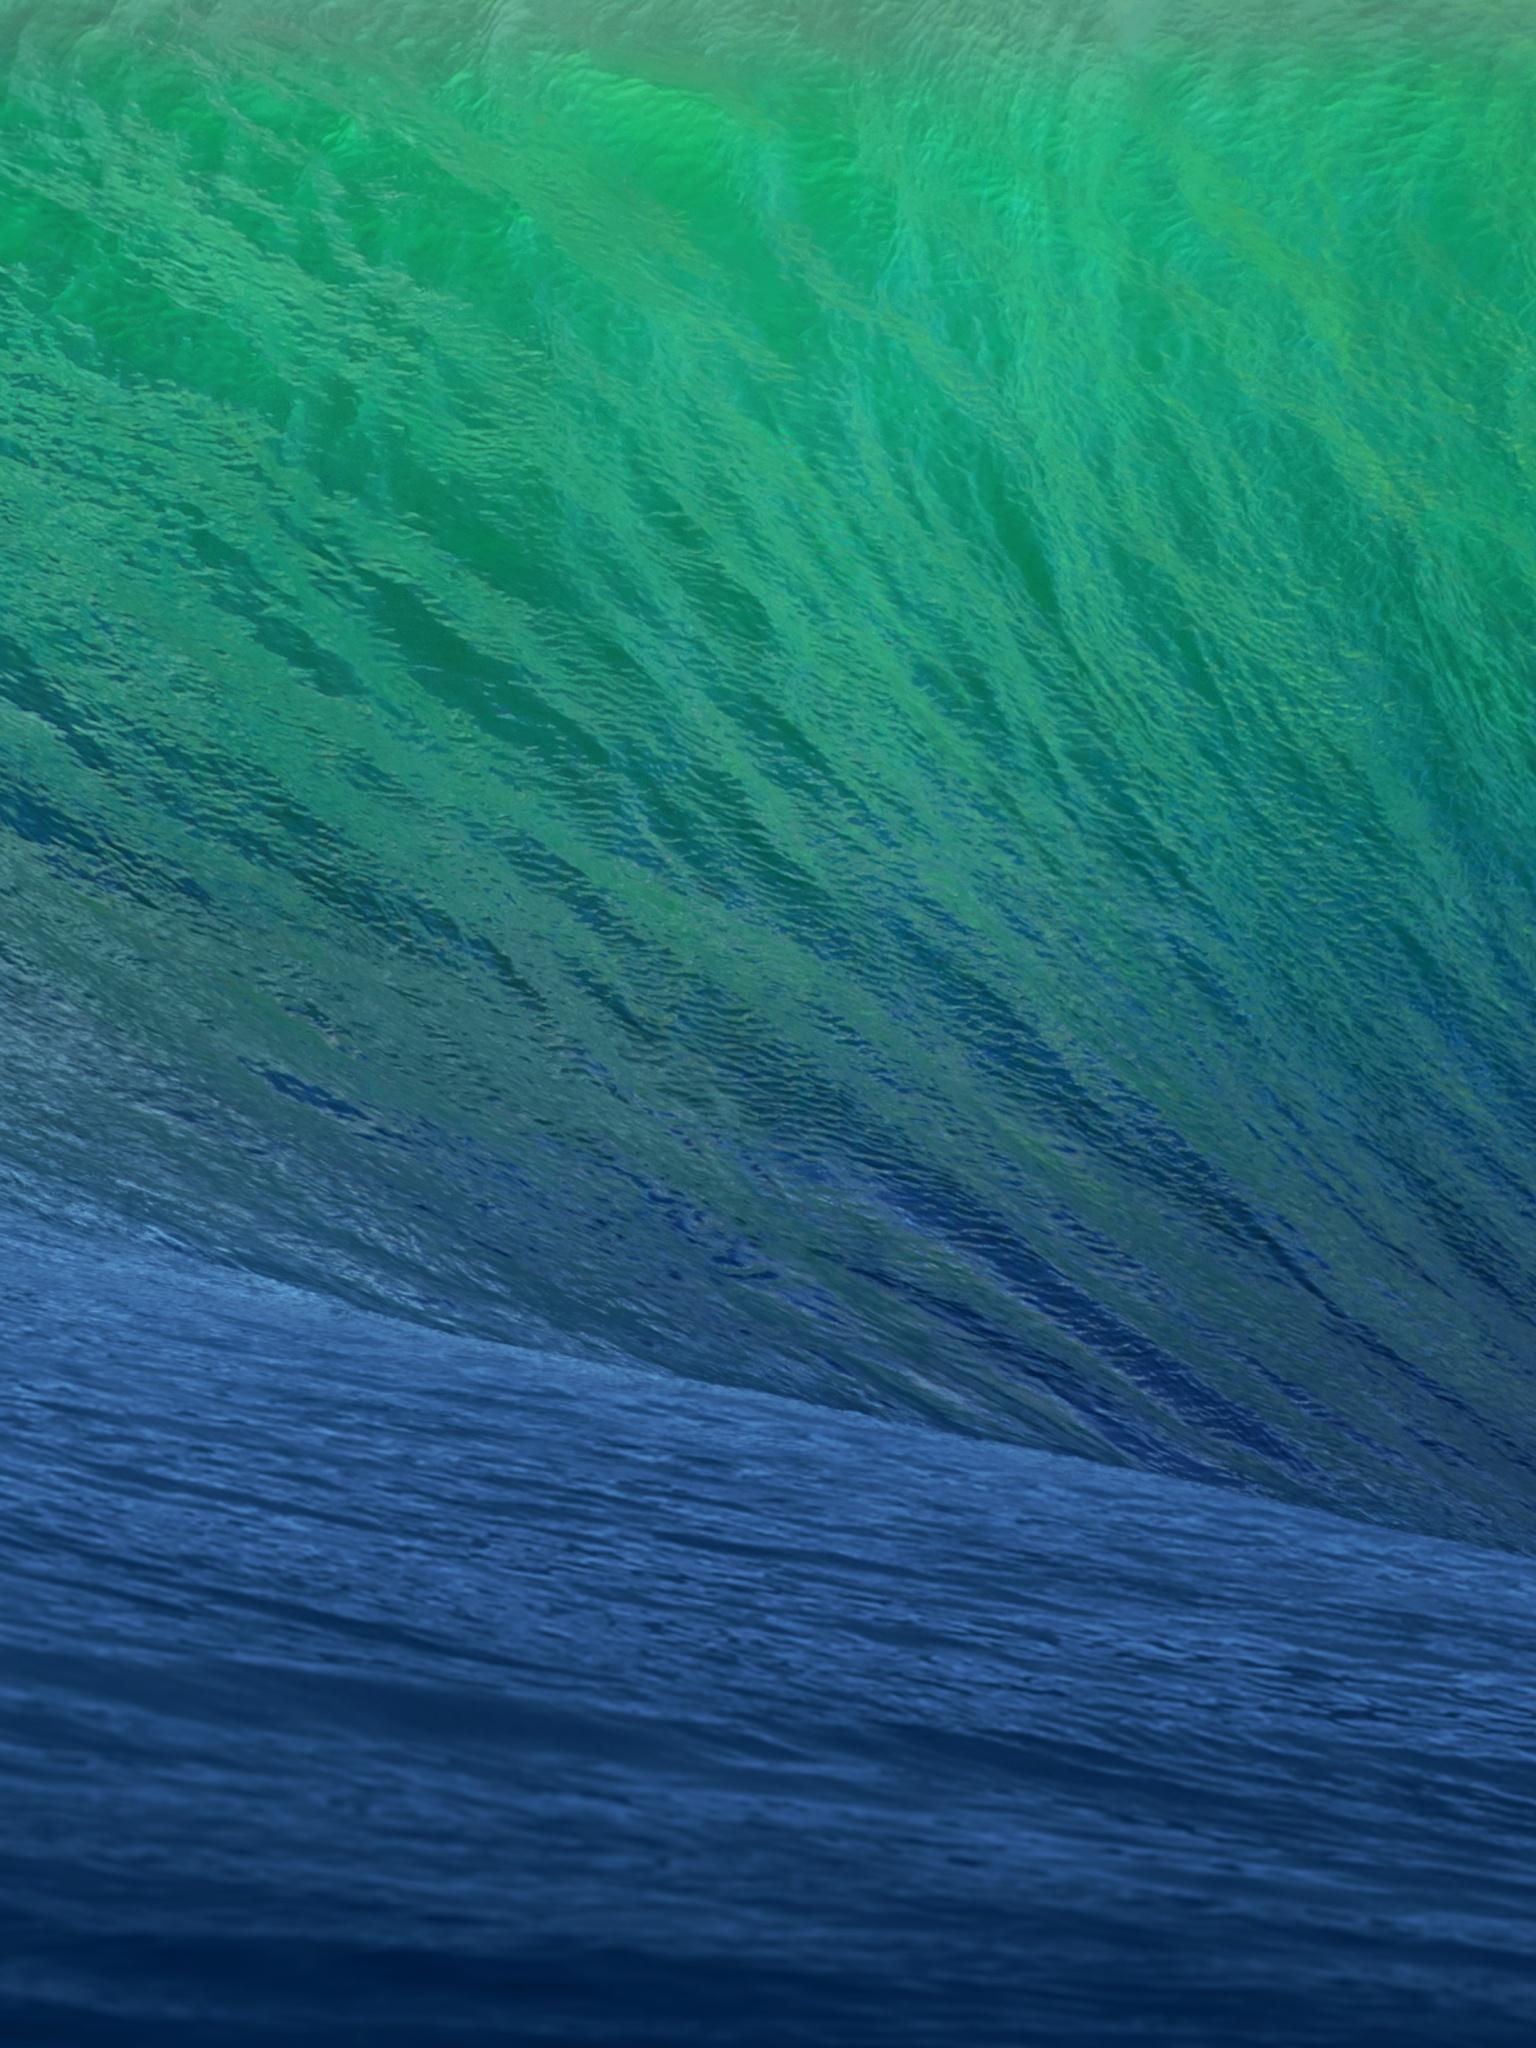 1536x2048 OS X Mavericks Wave Ipad 4 wallpaper 1536x2048